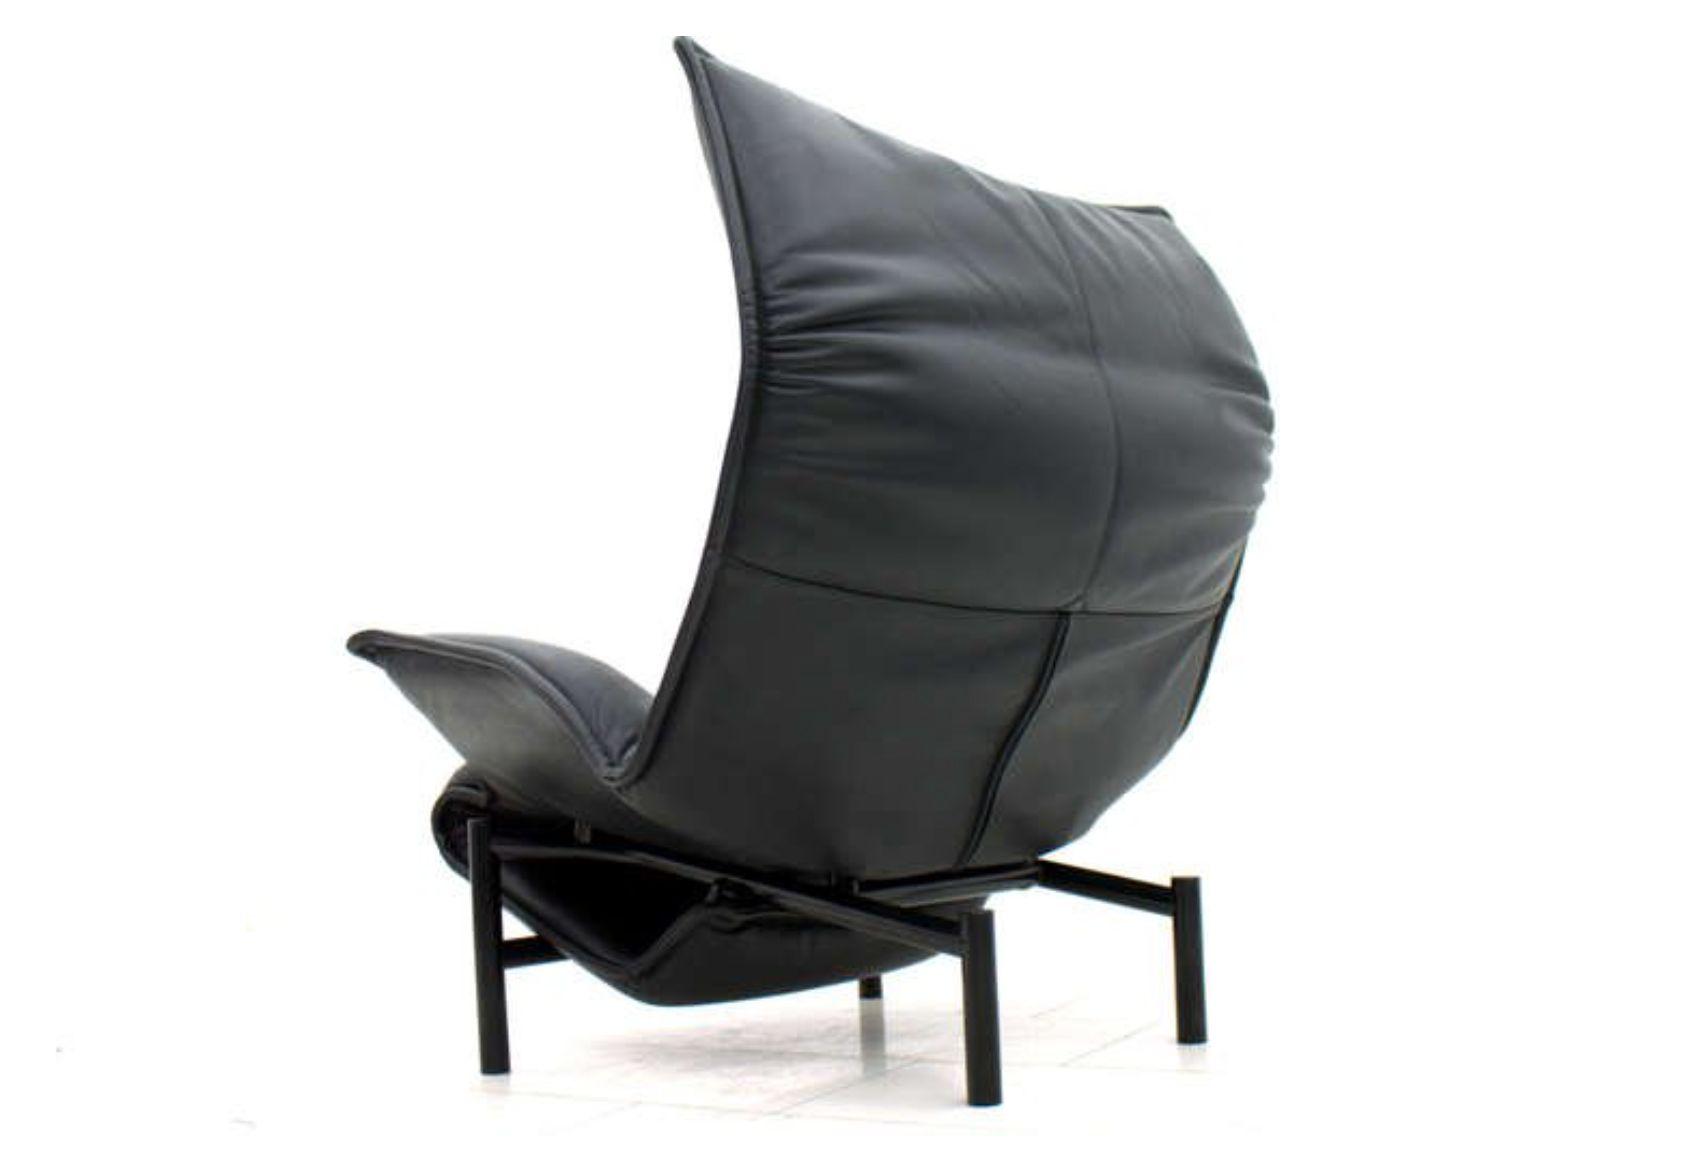 veranda chair design cover and sash hire bristol vintage italian leather lounge by vico